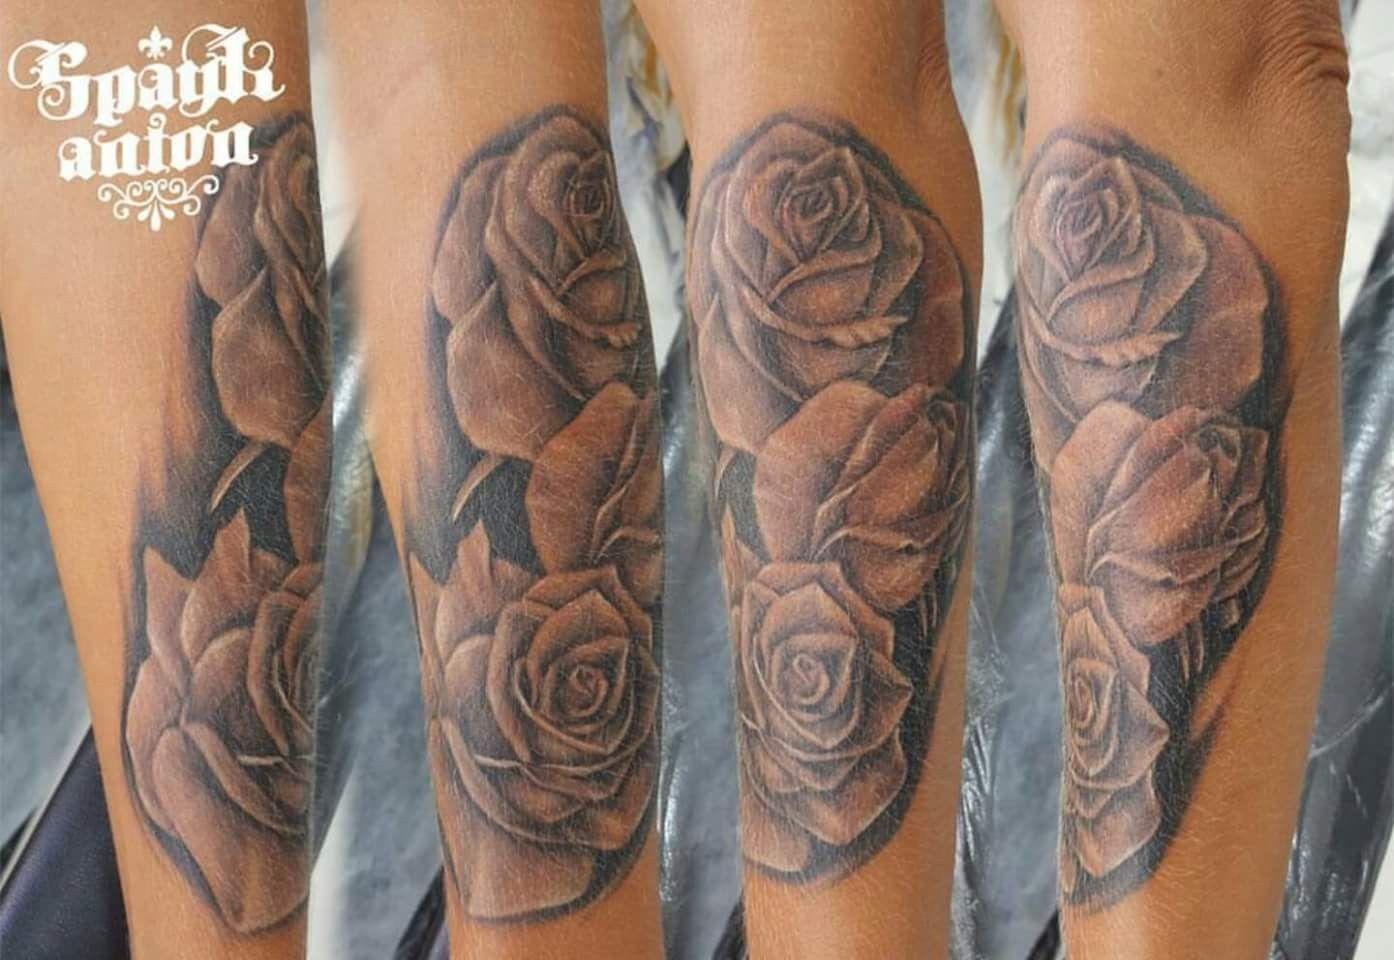 Pin by spayk tattooist on skin art tattoo pinterest